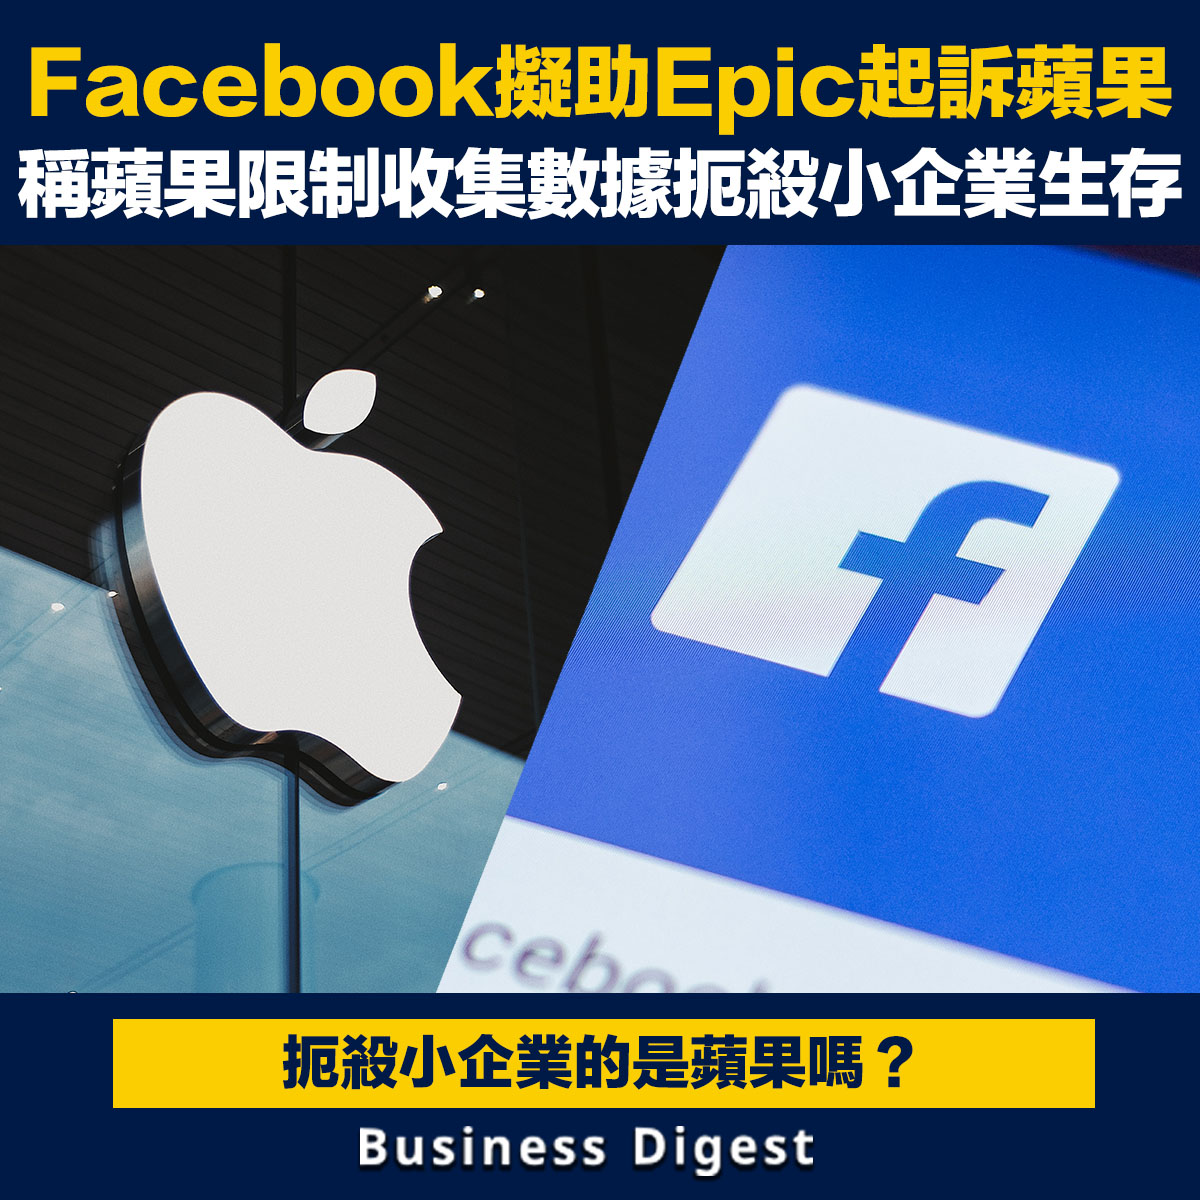 Facebook擬助Epic起訴蘋果,稱蘋果限制收集數據扼殺小企業生存